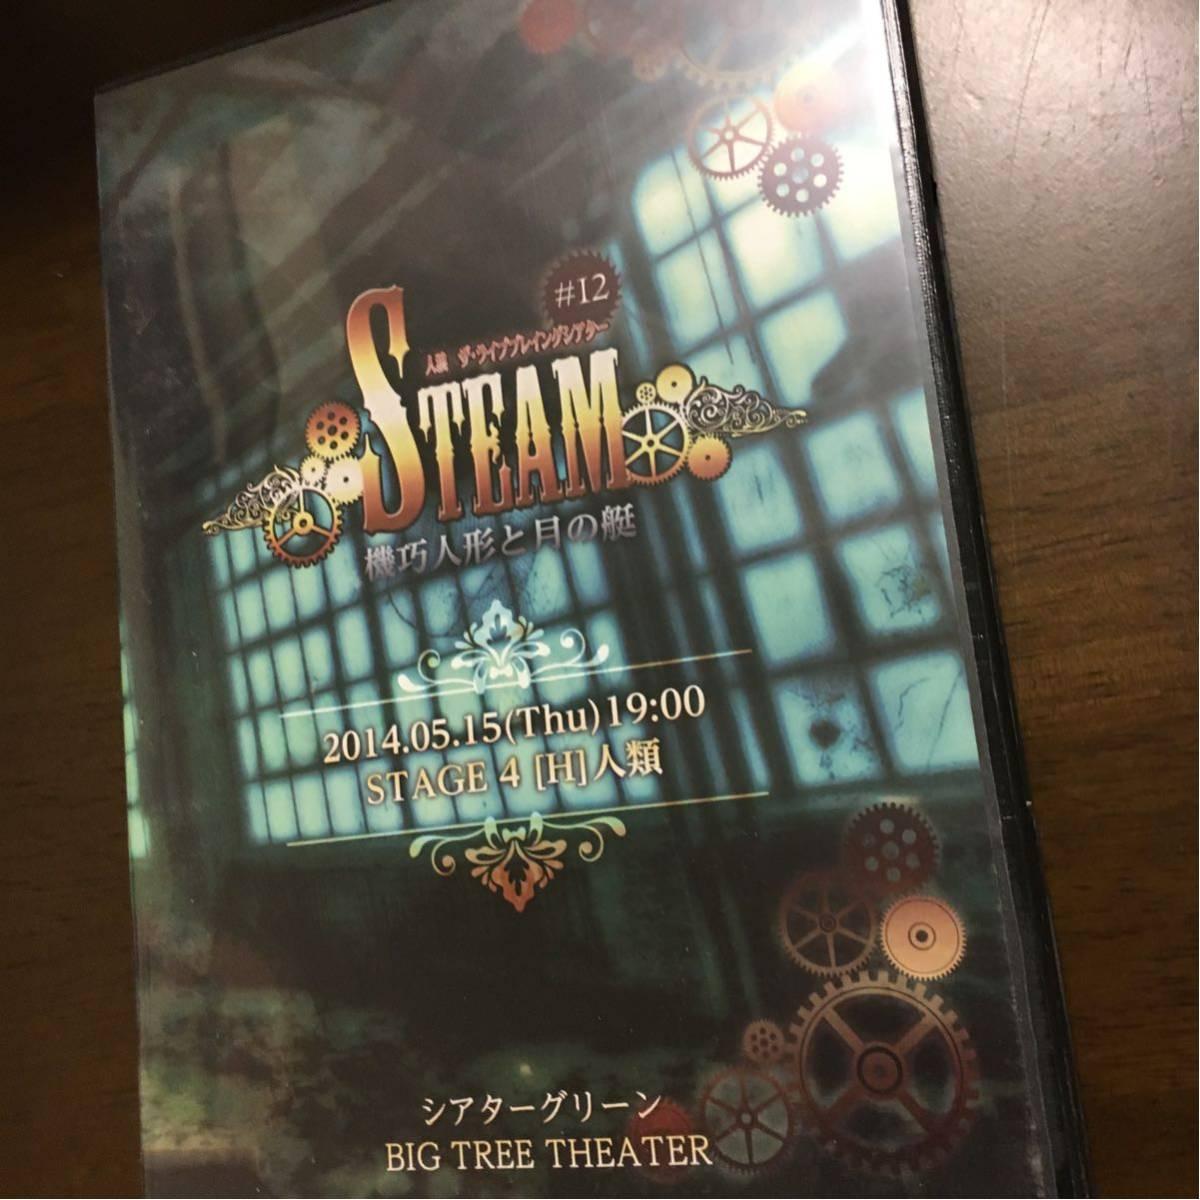 人狼 TLPT DVD 『STEAM 』松崎史也 高木俊 横山可奈子 ウチクリ内倉 溝口謙吾